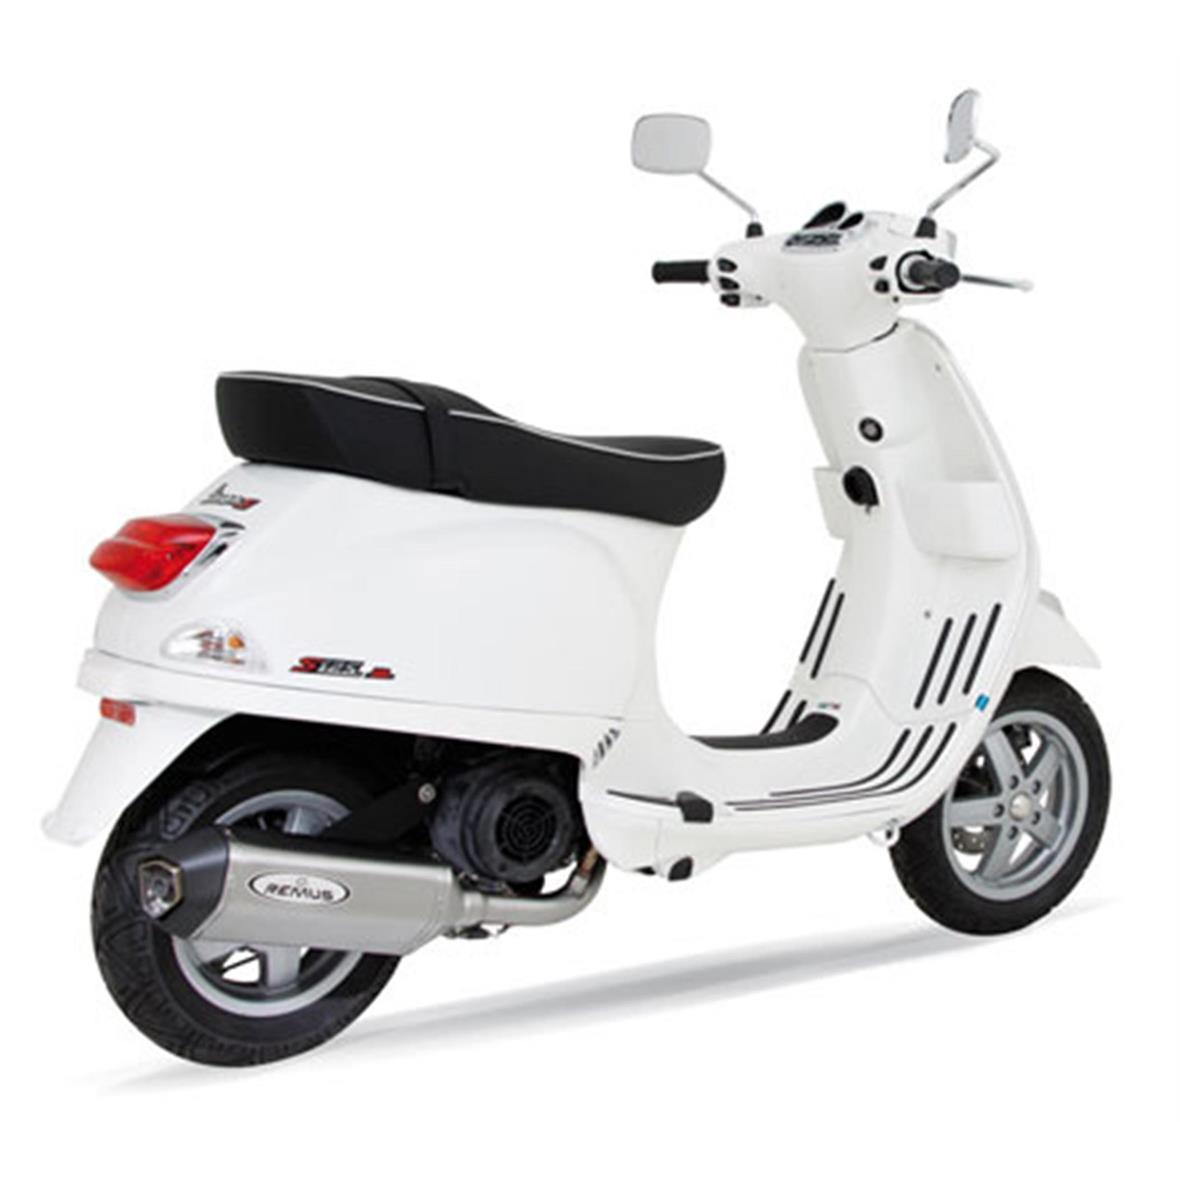 Racing Exhaust Remus Special Edition Sip Scootershop Com